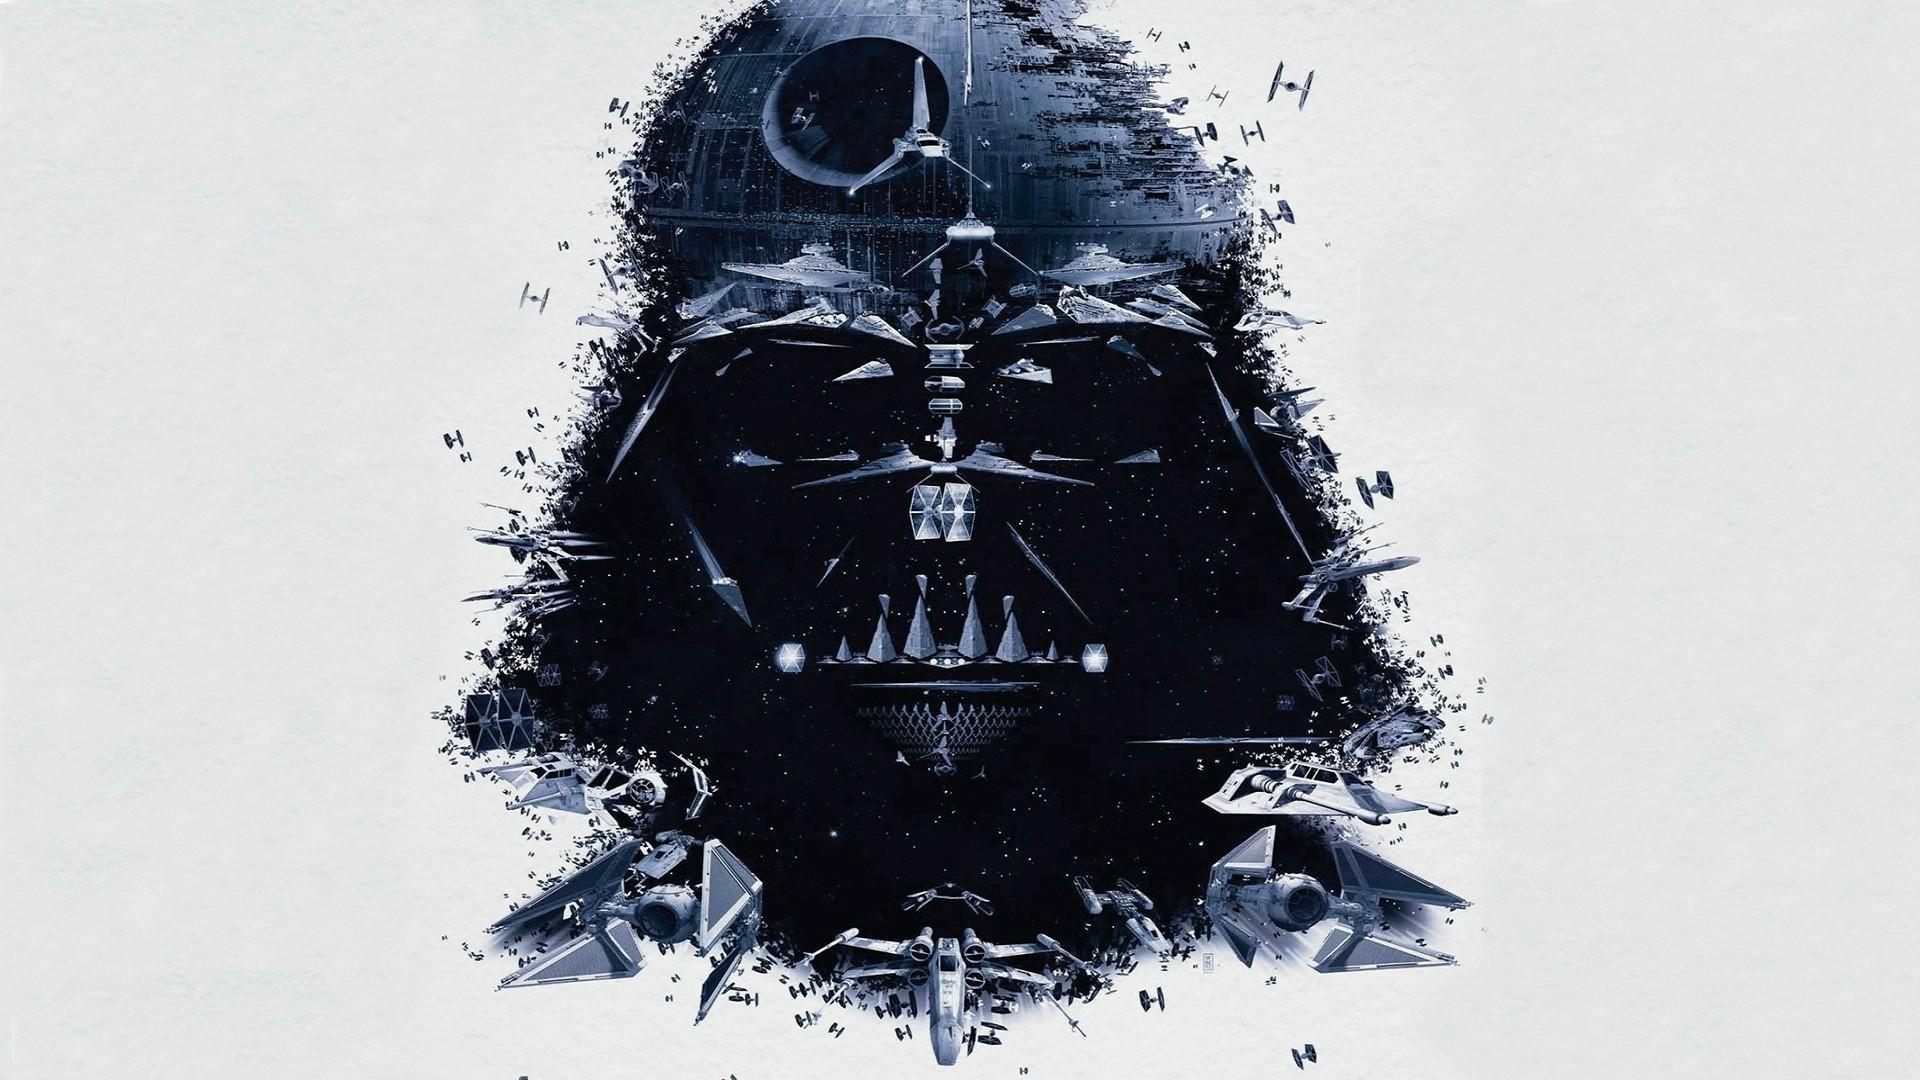 sith star wars darth maul dark side 2 Star Wars HD Desktop Wallpapers for  Widescreen,